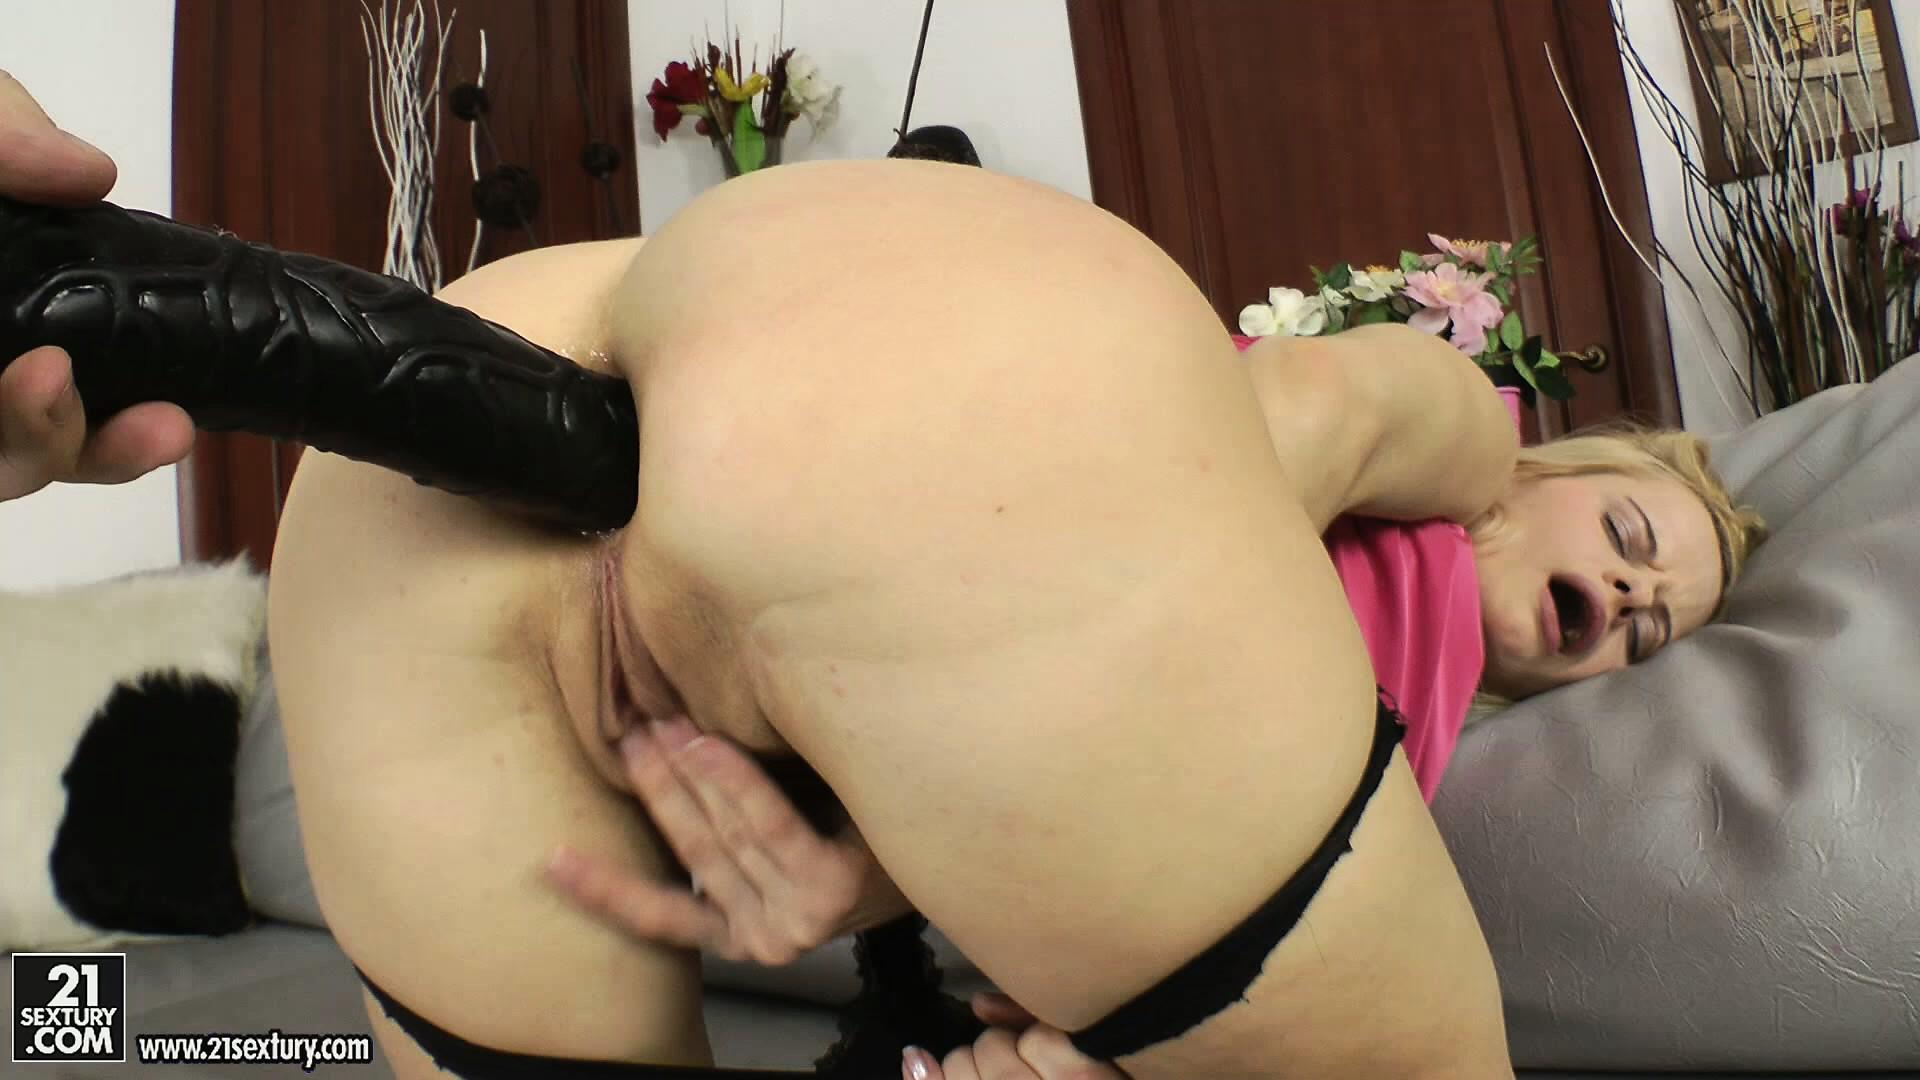 Lesbian anal strapon dancing bear.com